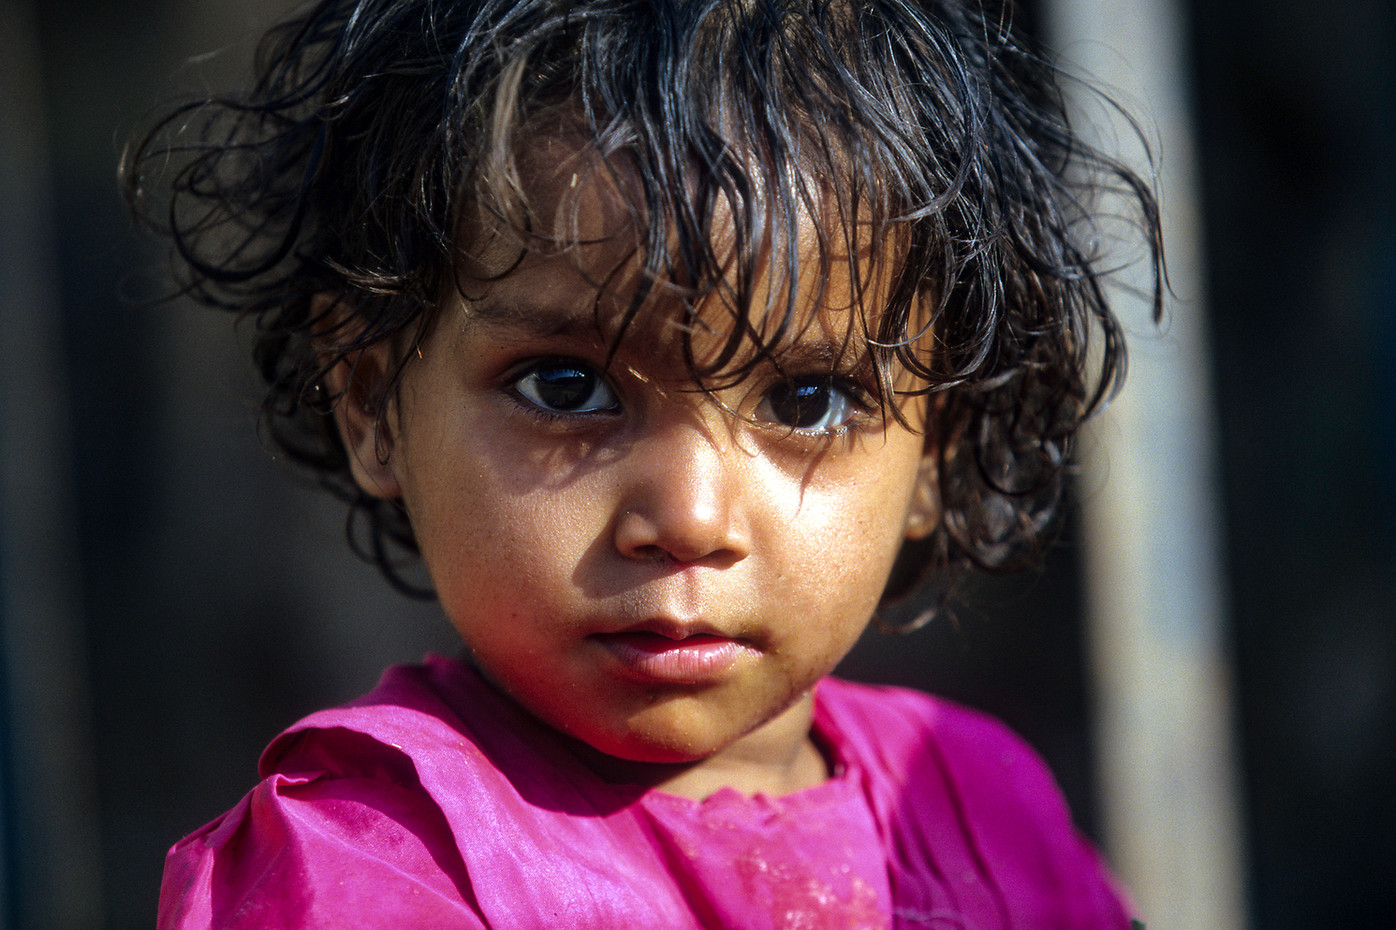 Young girl in Chittaurgarh, India